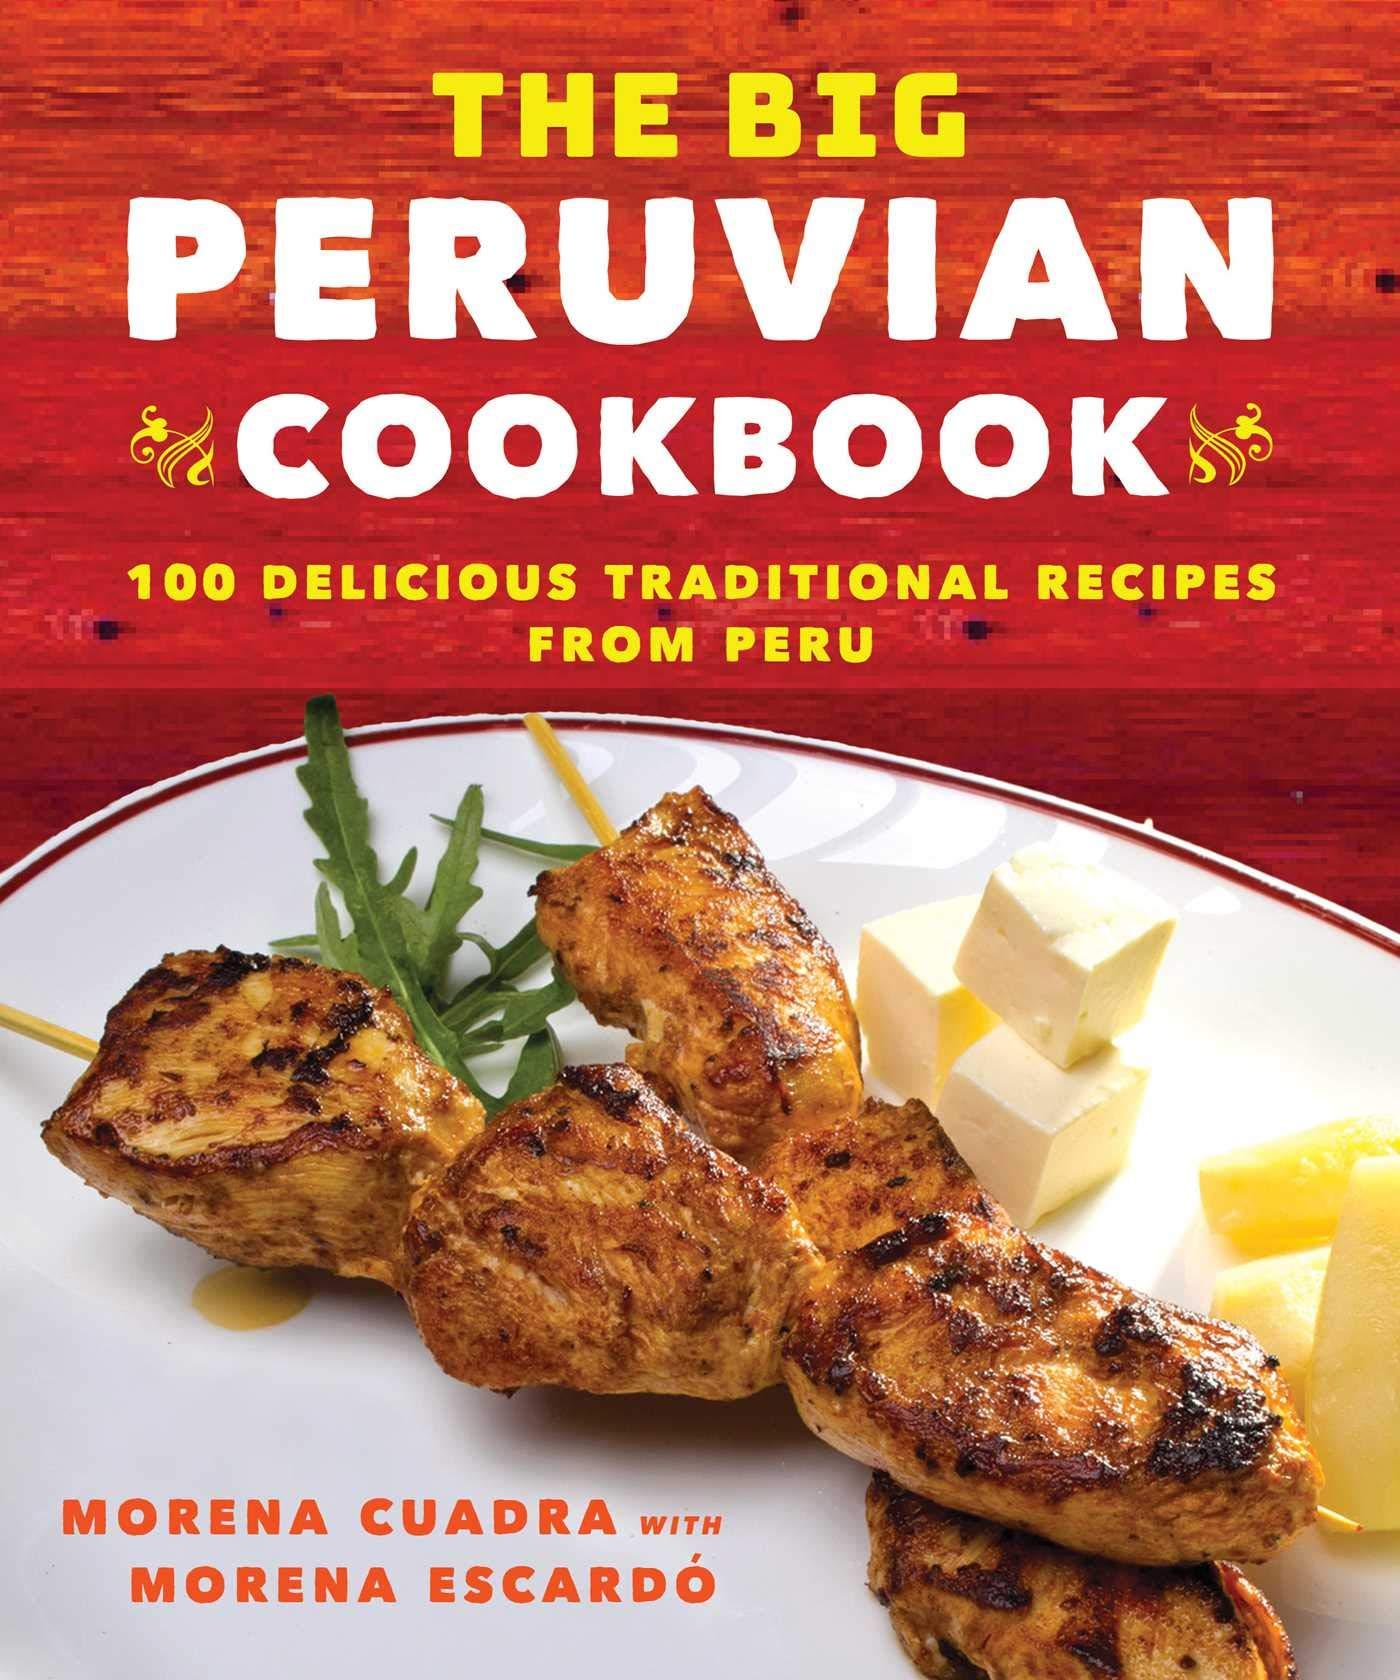 The Big Peruvian Cookbook  100 Delicious Traditional Recipes From Peru